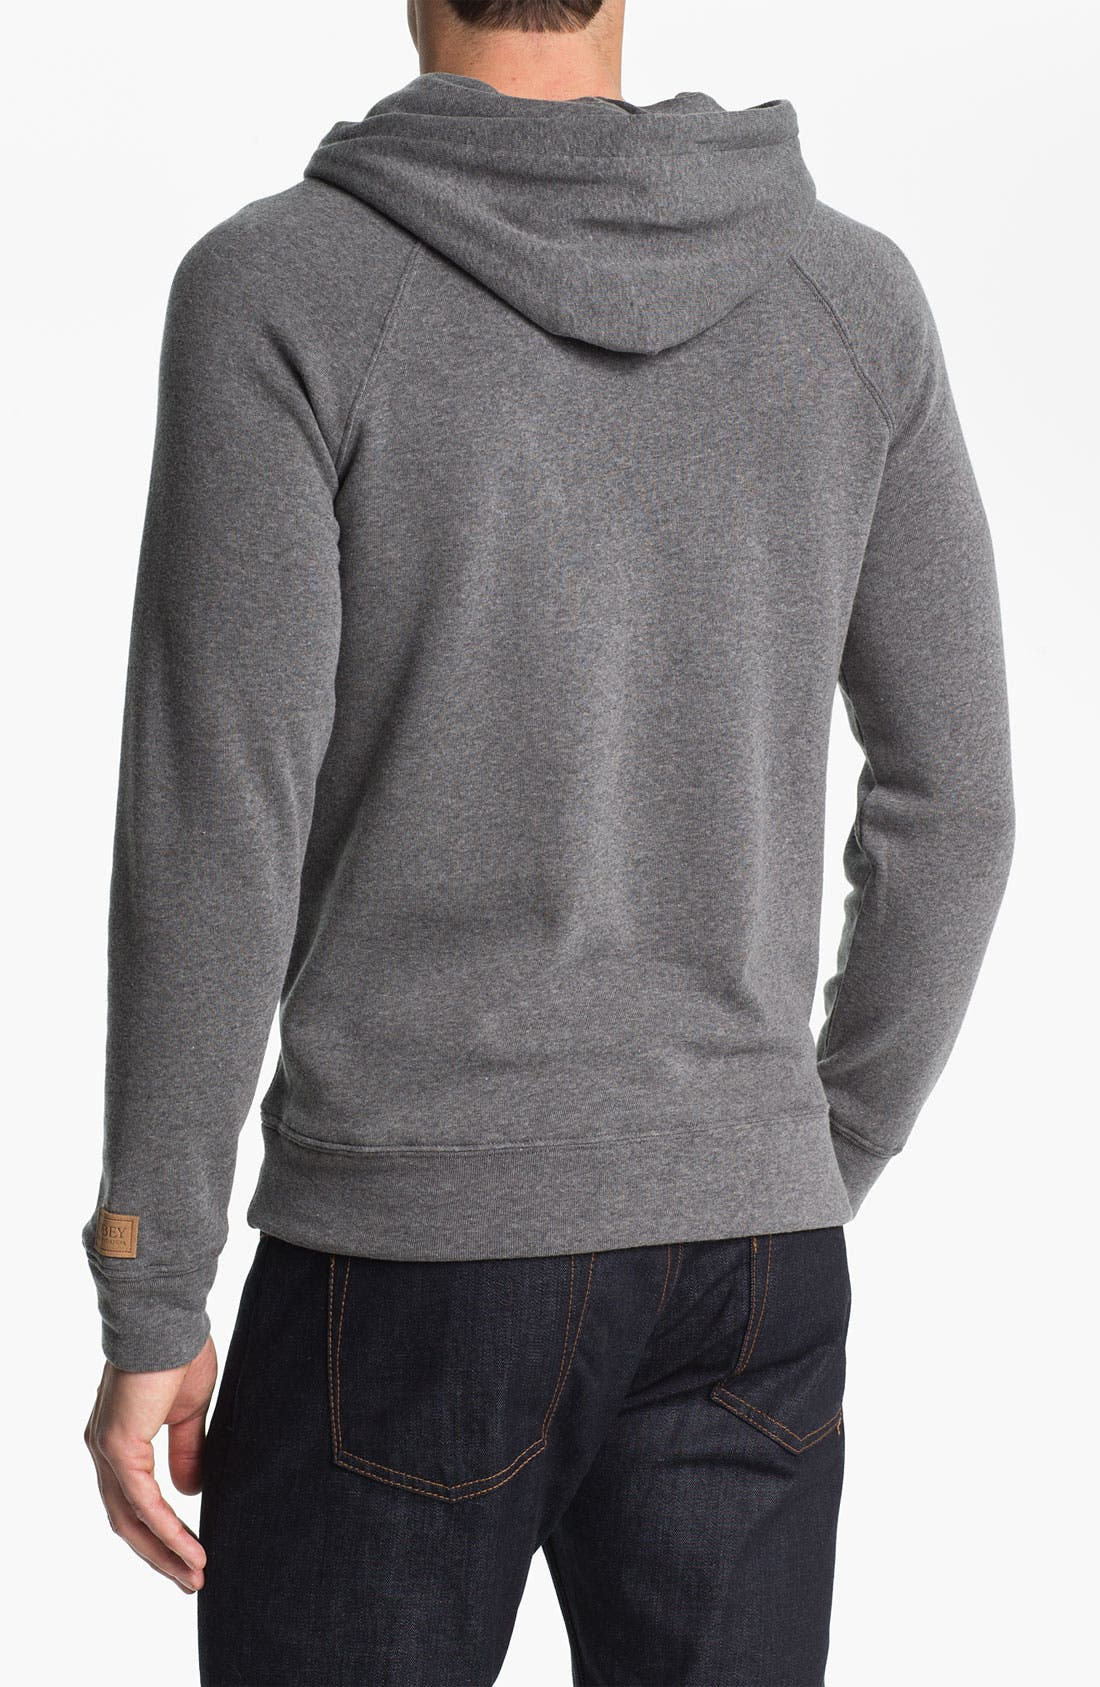 'Lofty Creature Comforts' Hooded Sweatshirt,                             Alternate thumbnail 2, color,                             060